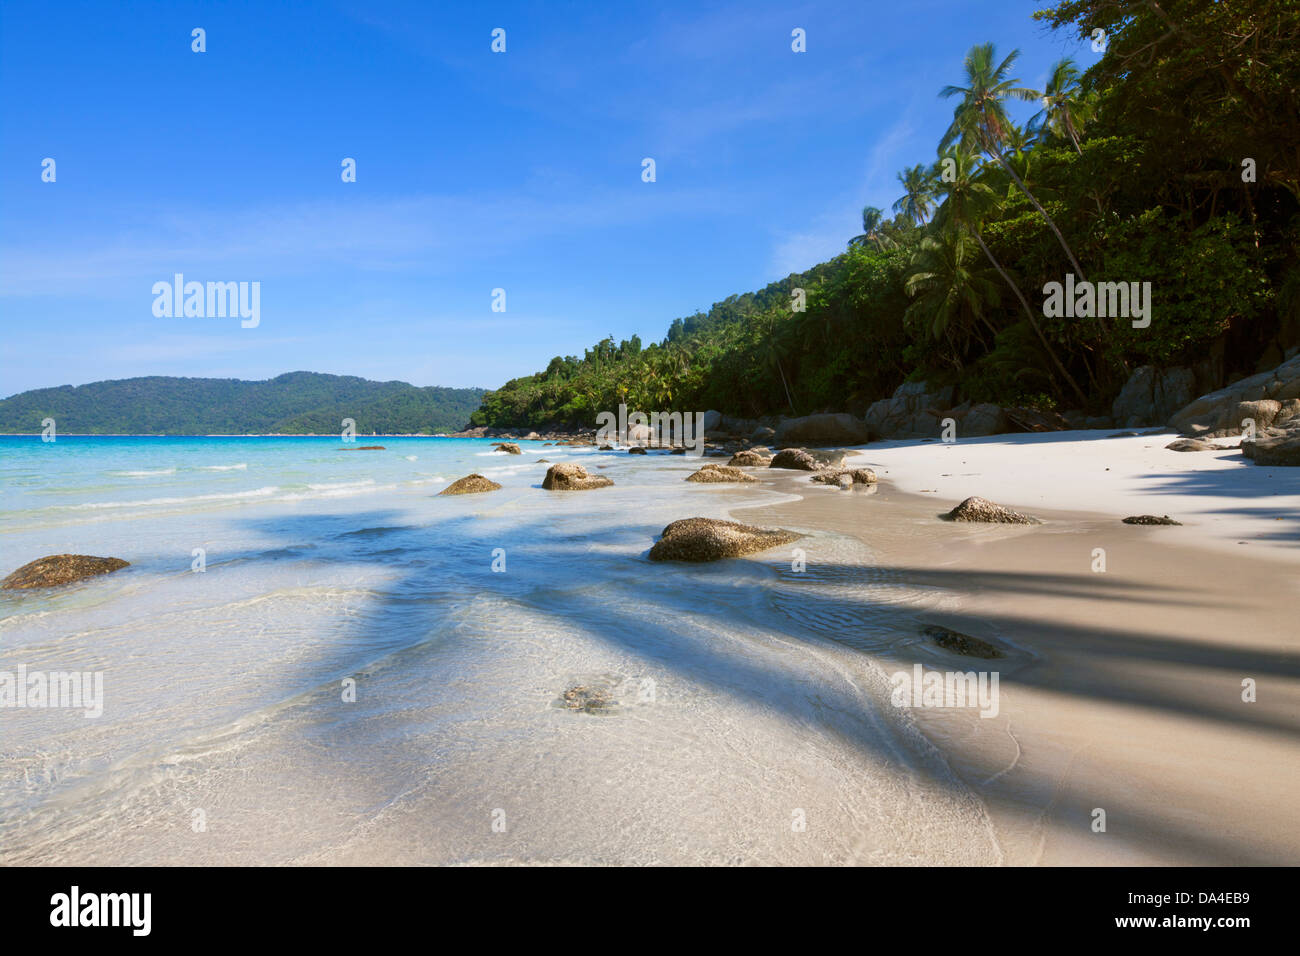 Deserted beach, Perhentian Islands, Terengganu, Malaysia - Stock Image